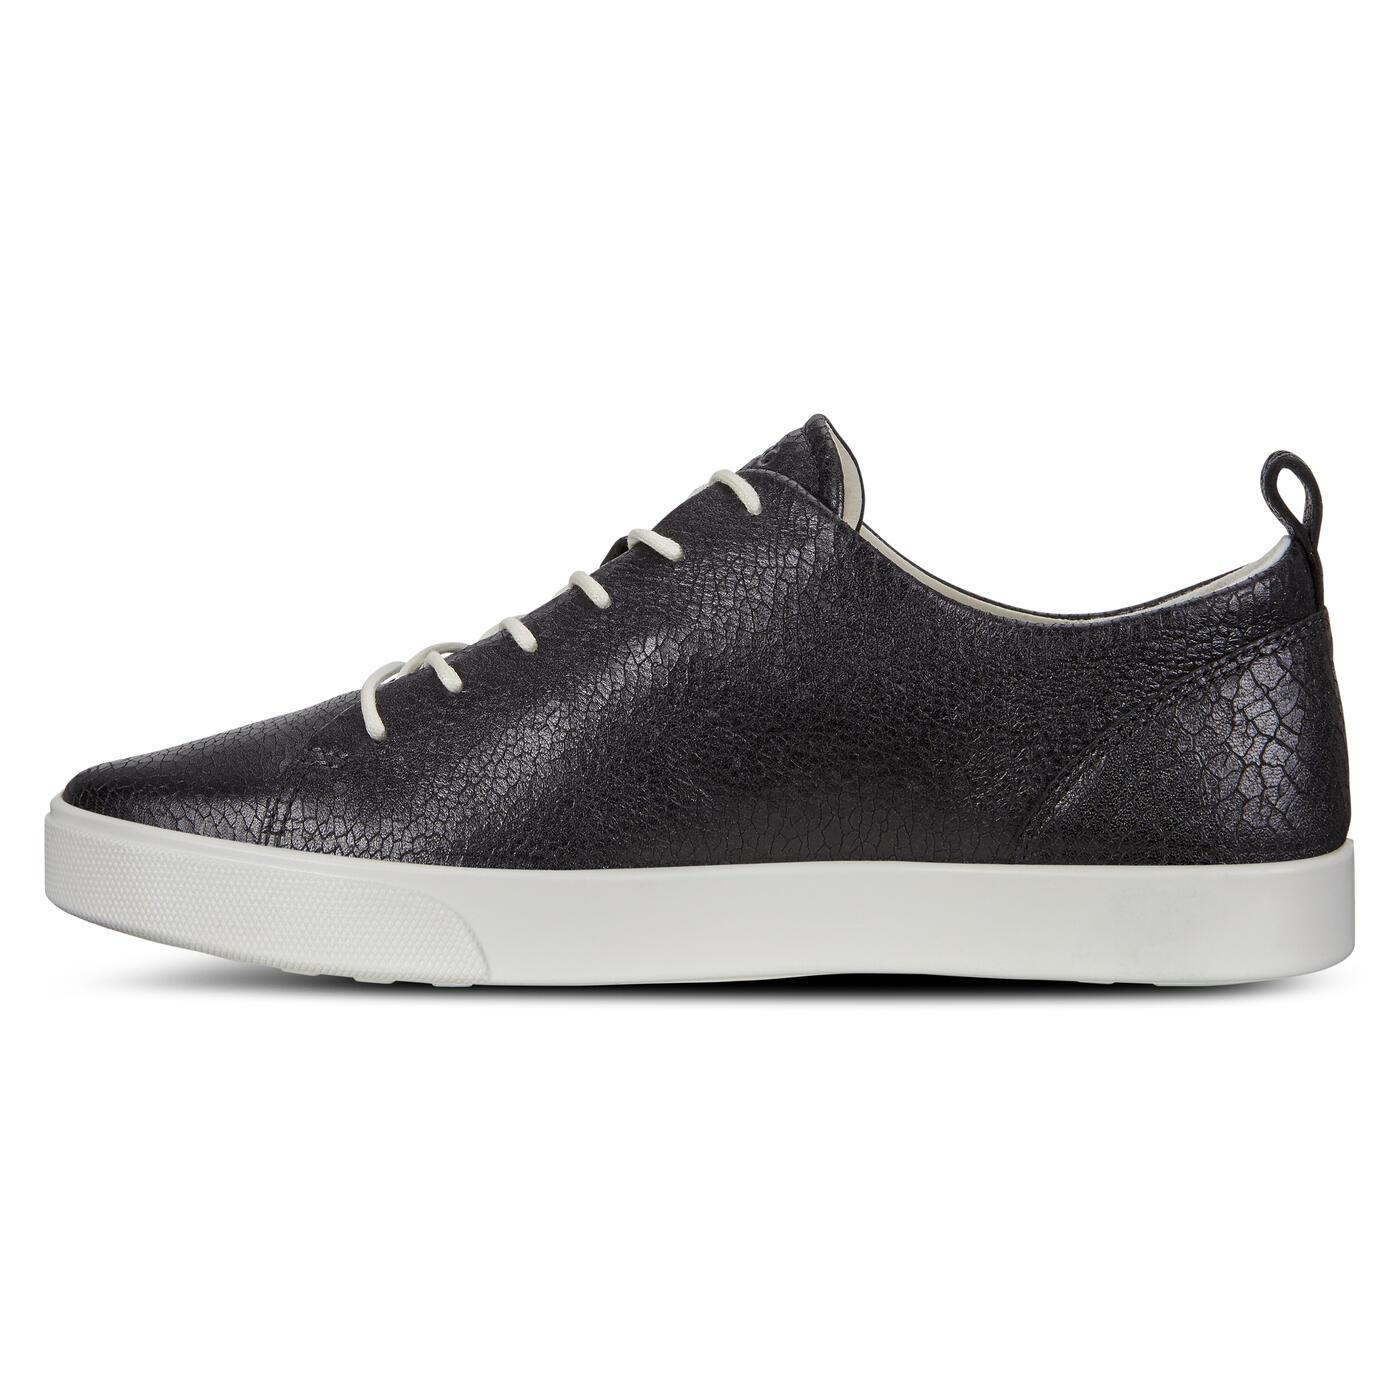 ECCO GILLIAN Shoe